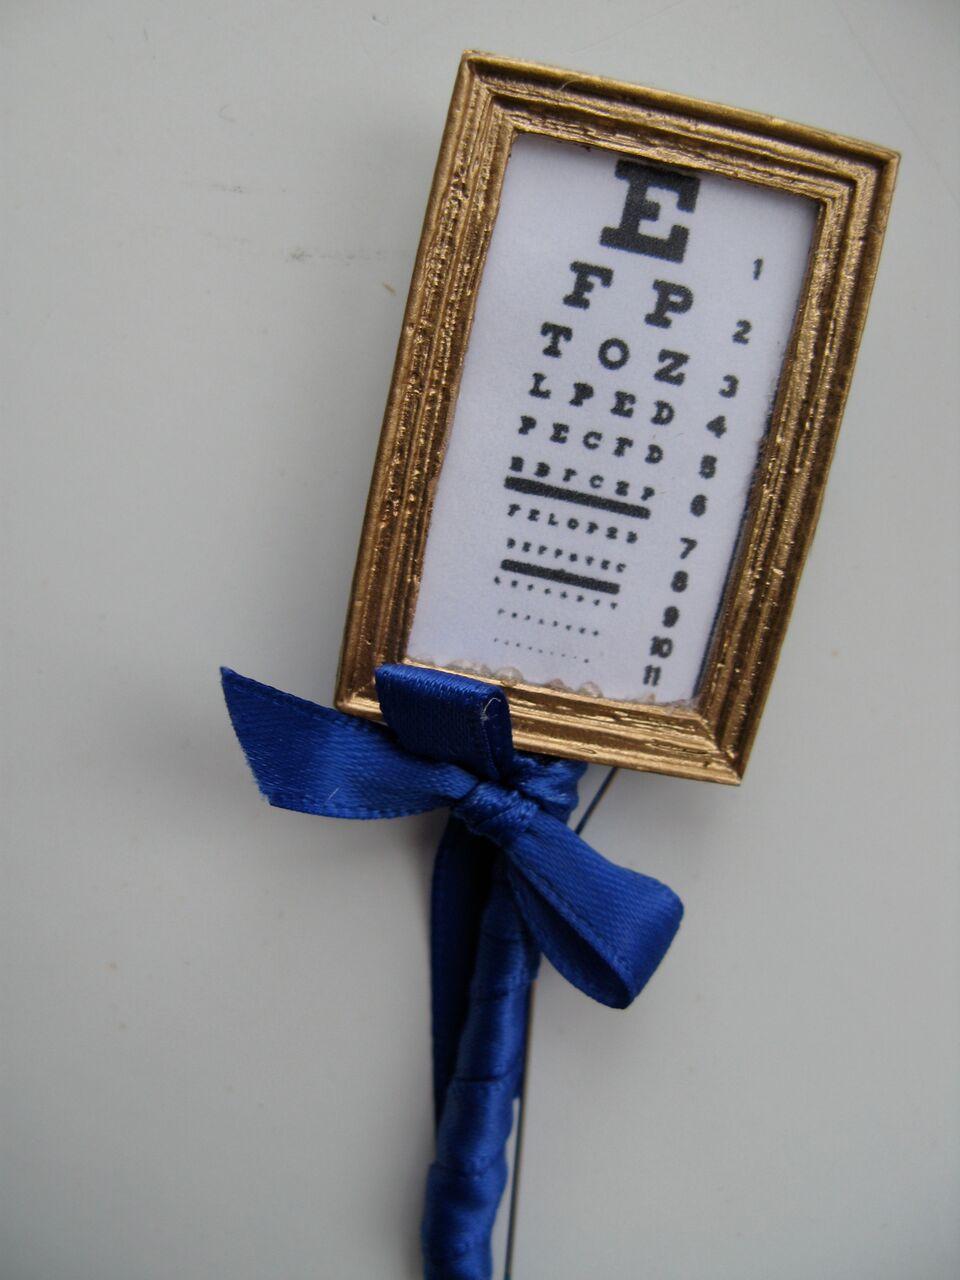 eyeglasses?